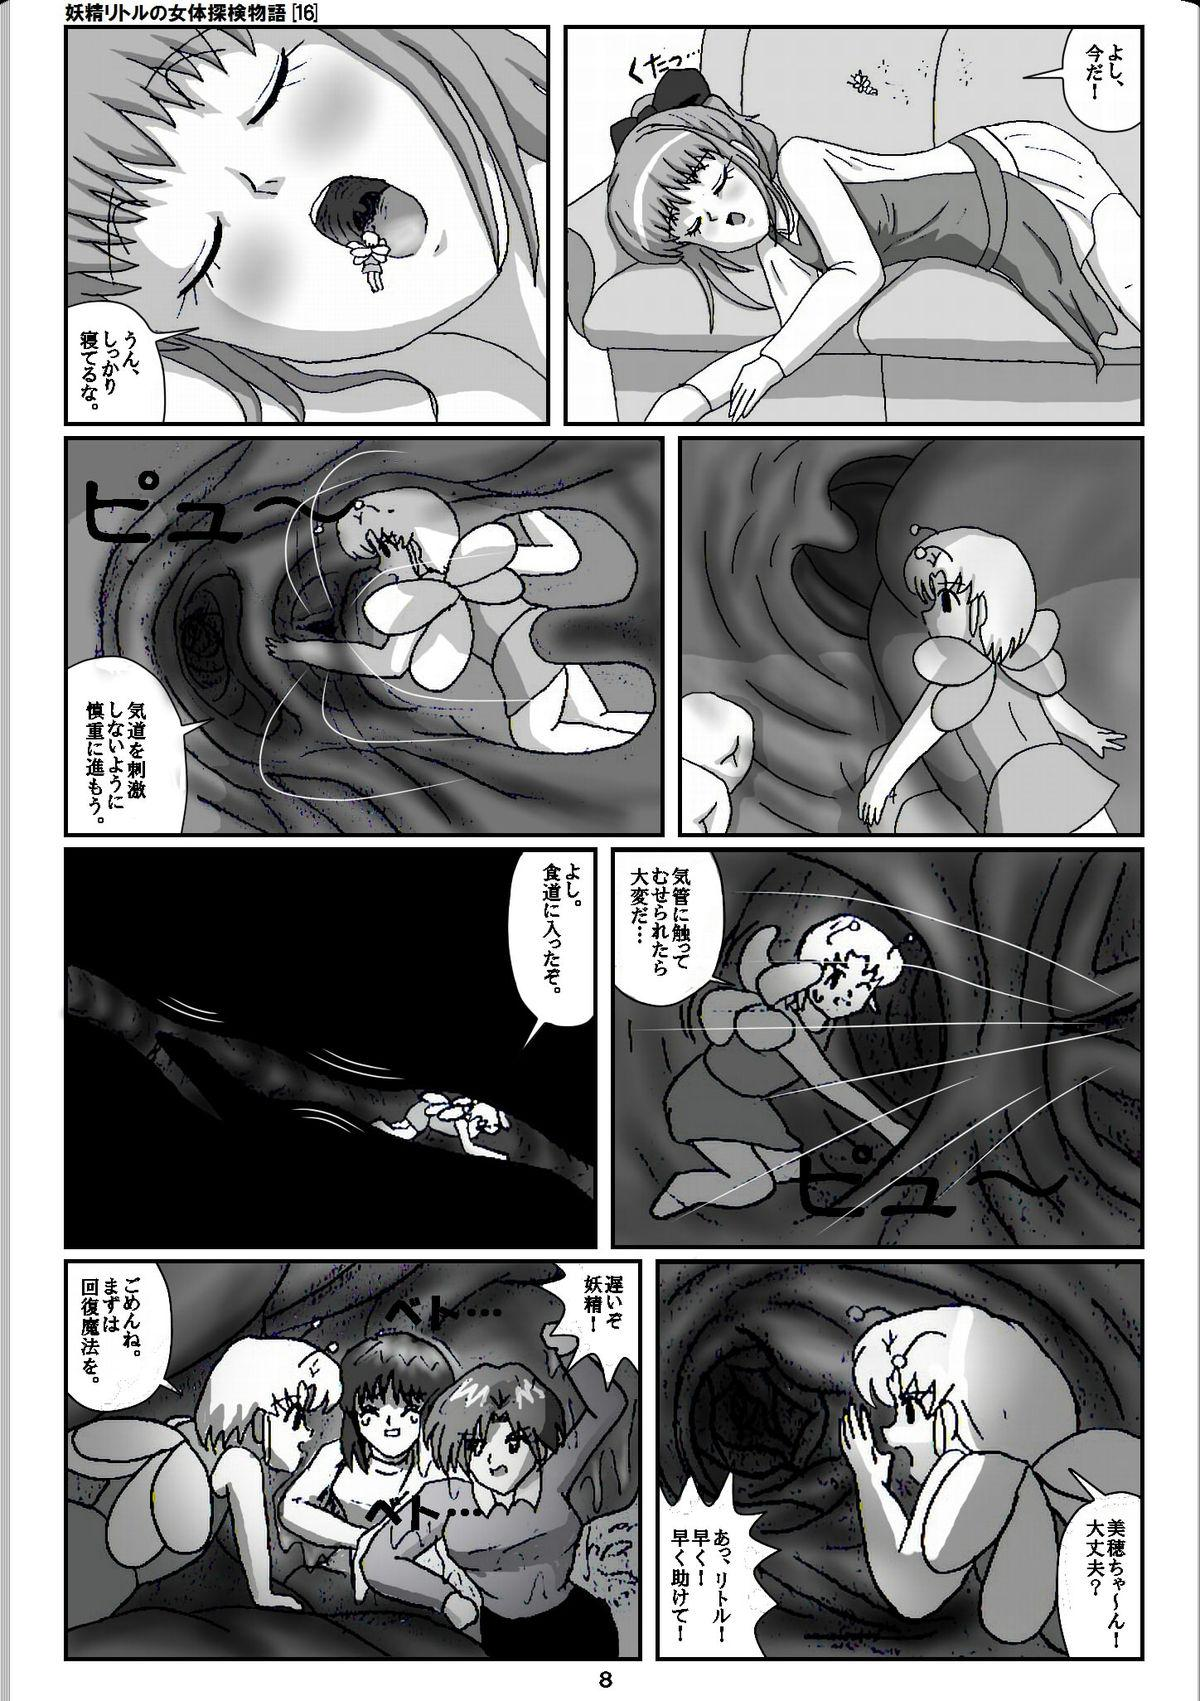 Yousei Little no Nyotai Tanken Monogatari 7